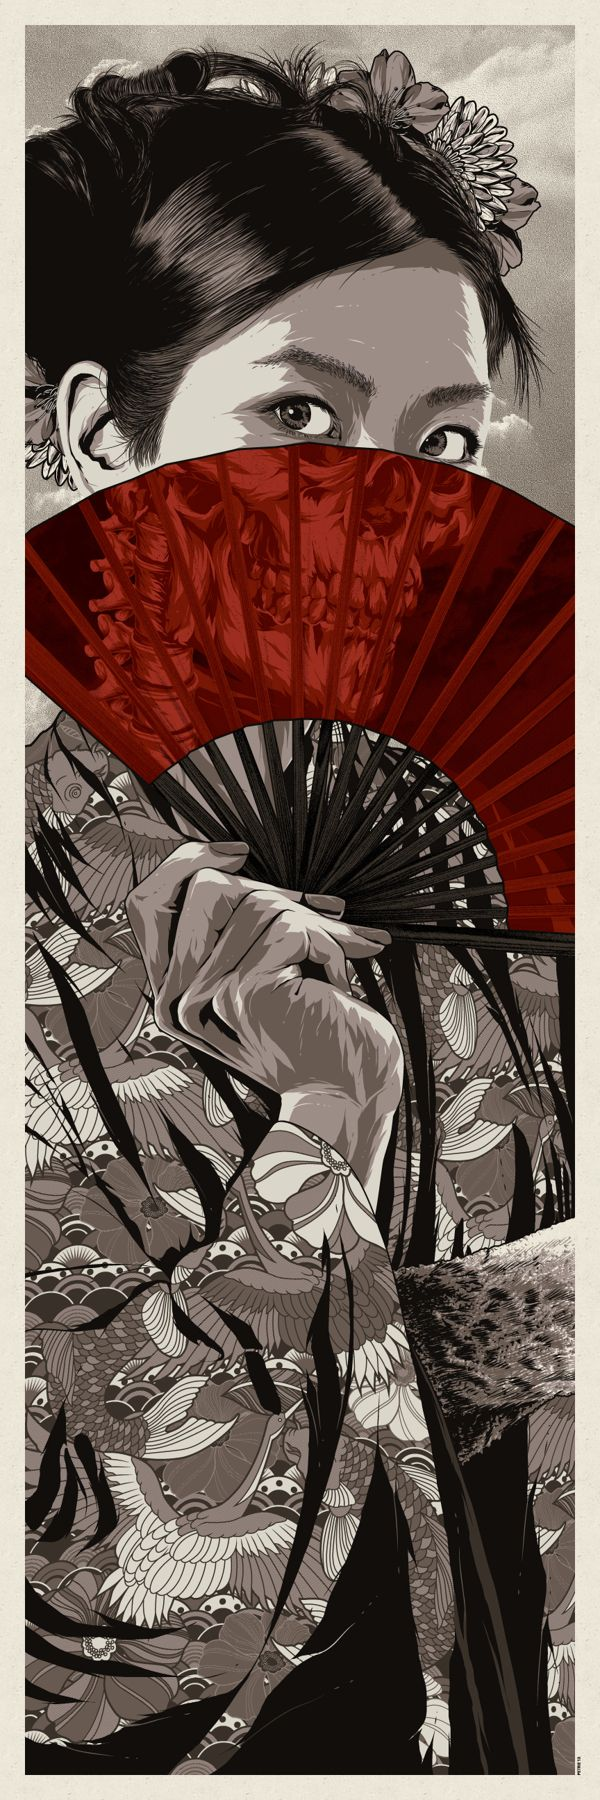 A Warrior's Dreams | Fantasy Art | Pinterest